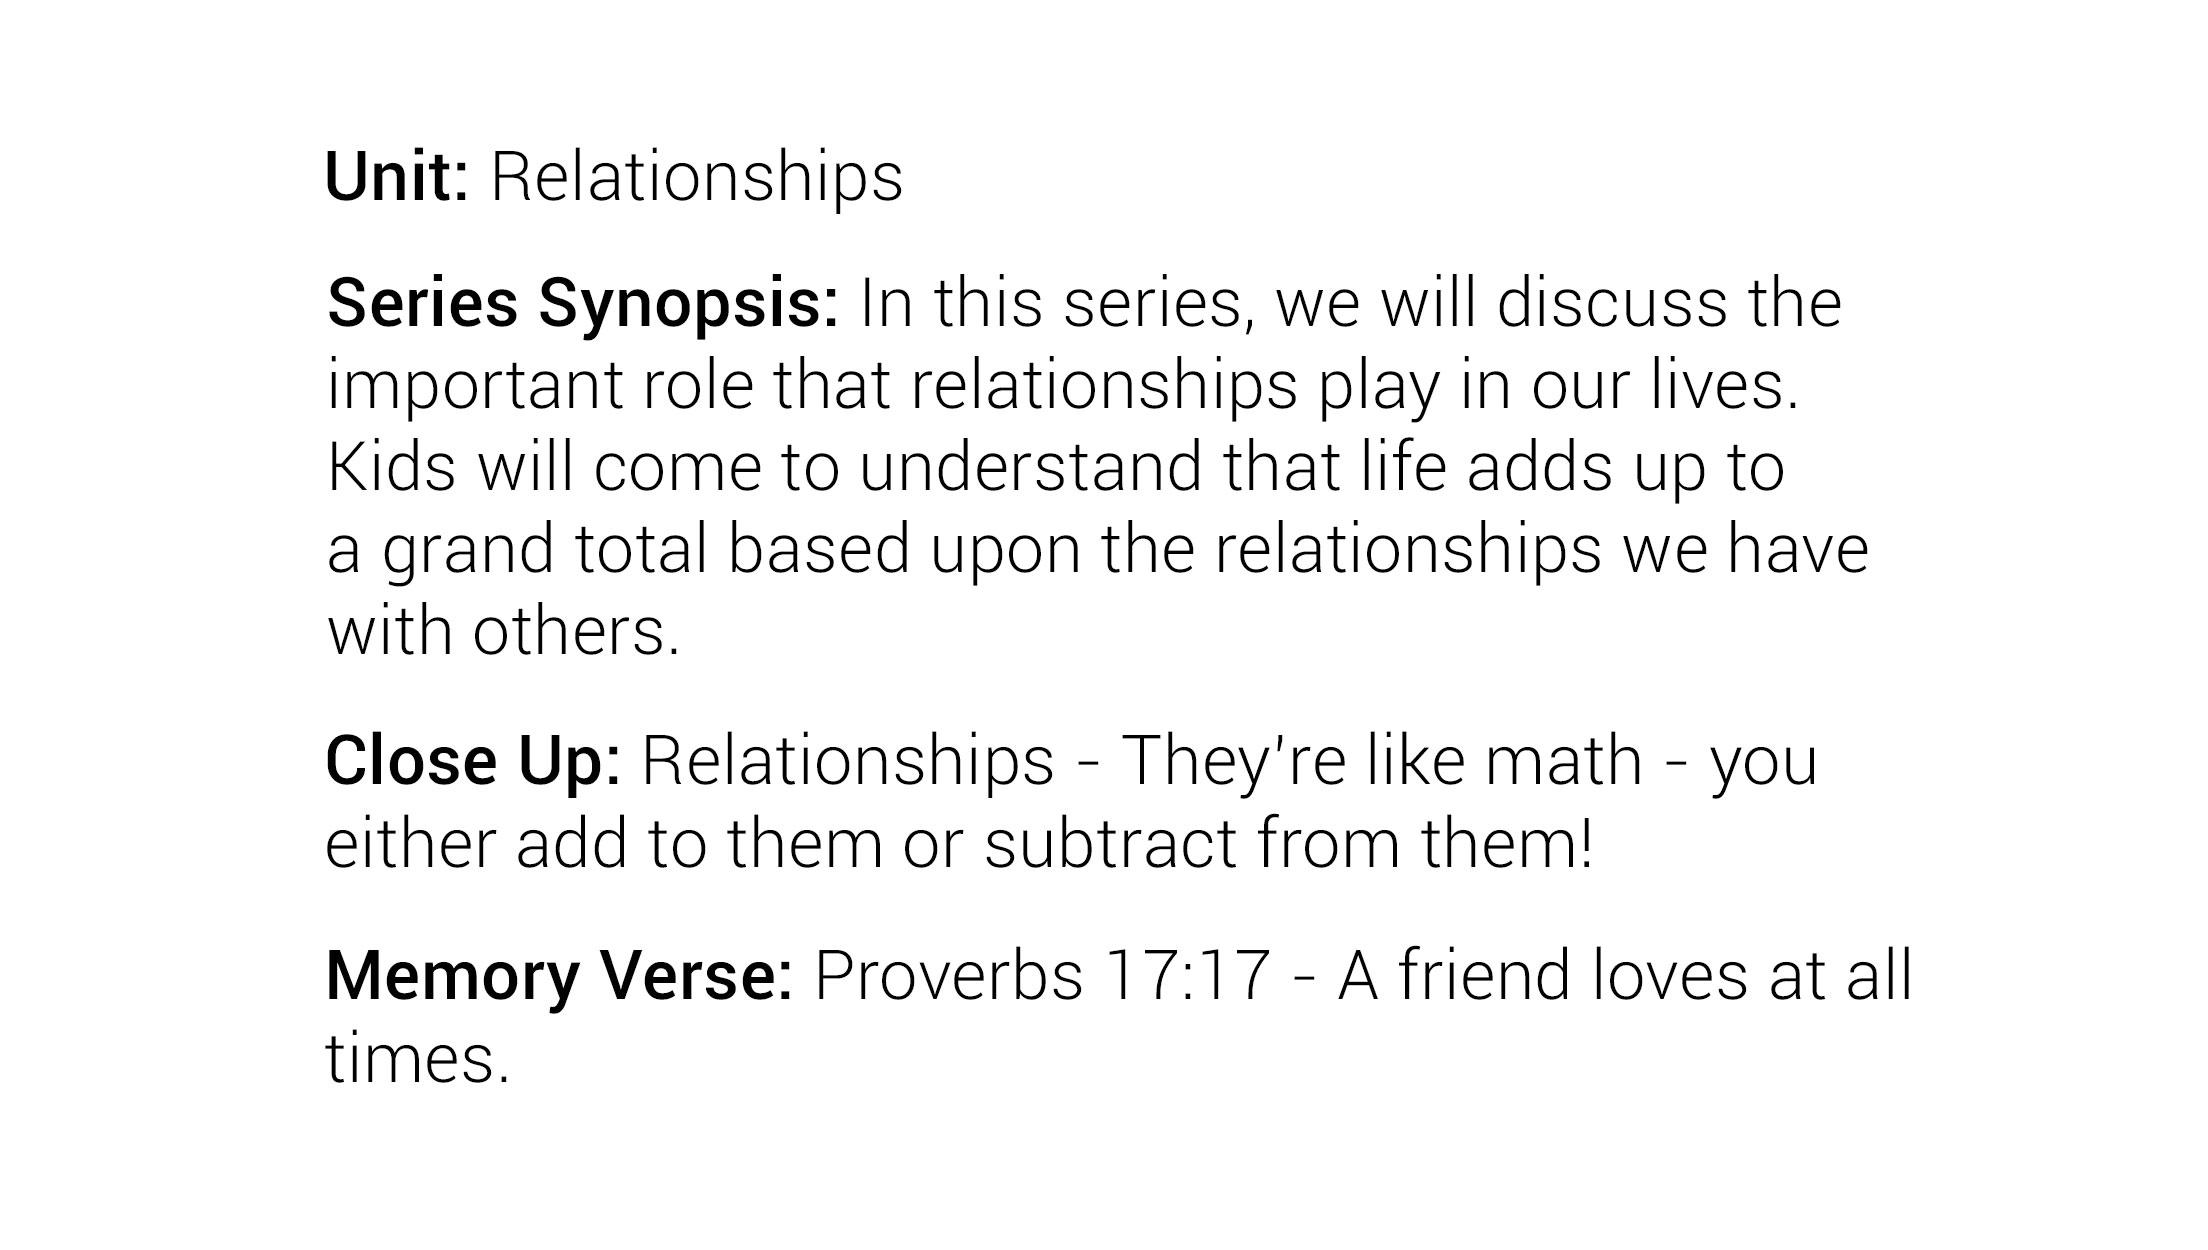 Scope_Relationships_CloseUp-4.07.29-PM.jpg